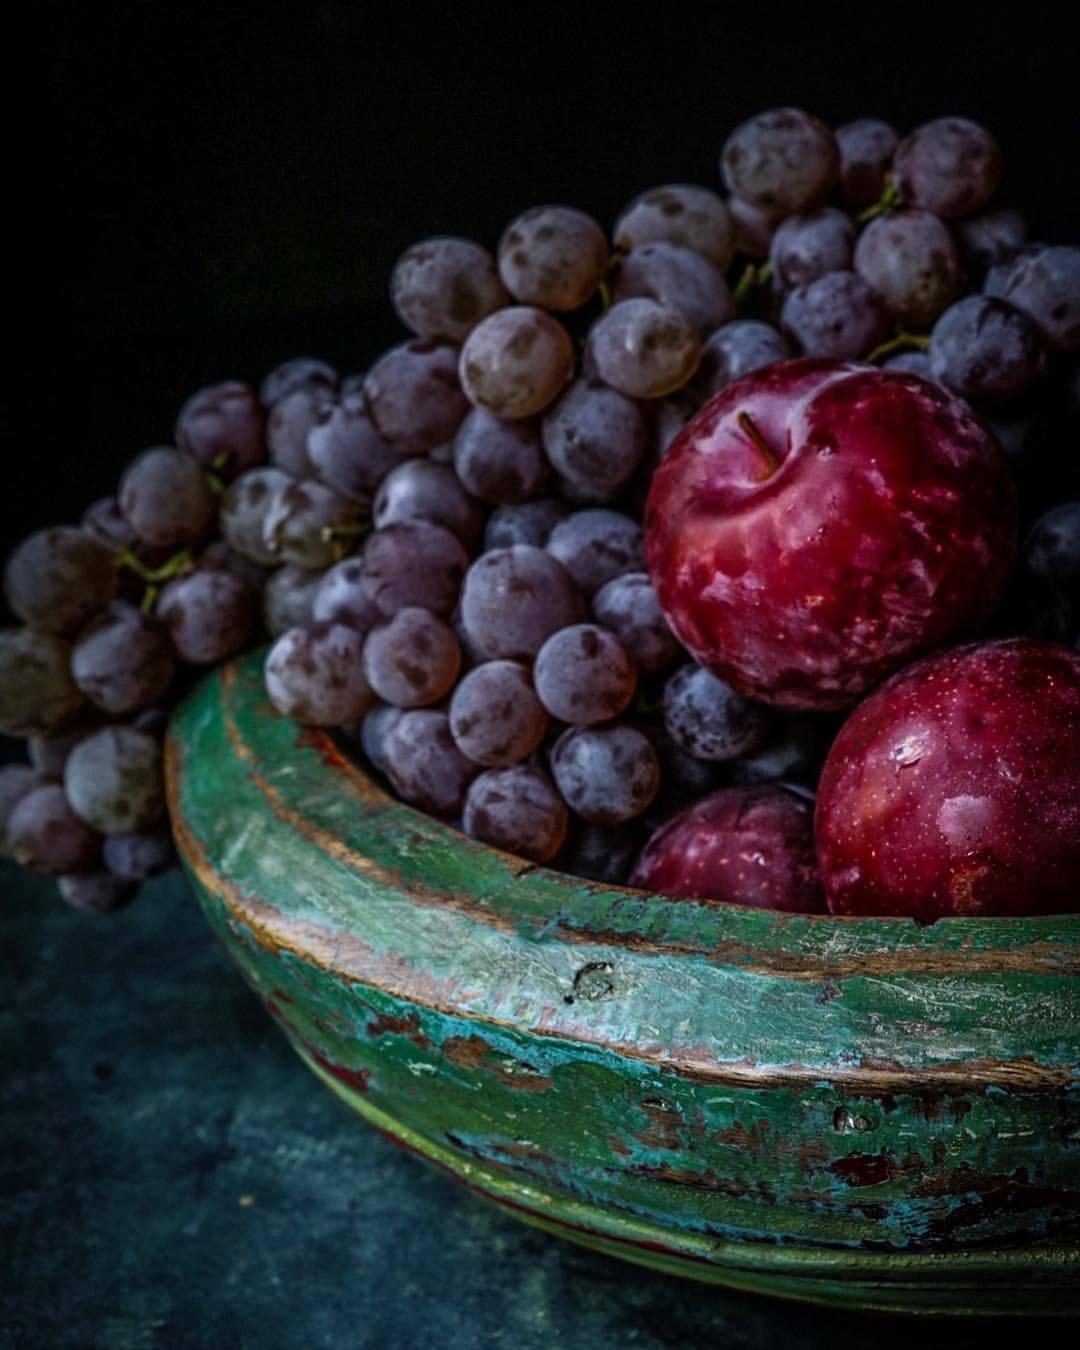 Farmhouse On The Hill | Fruit, Green bowl, Purple grapes